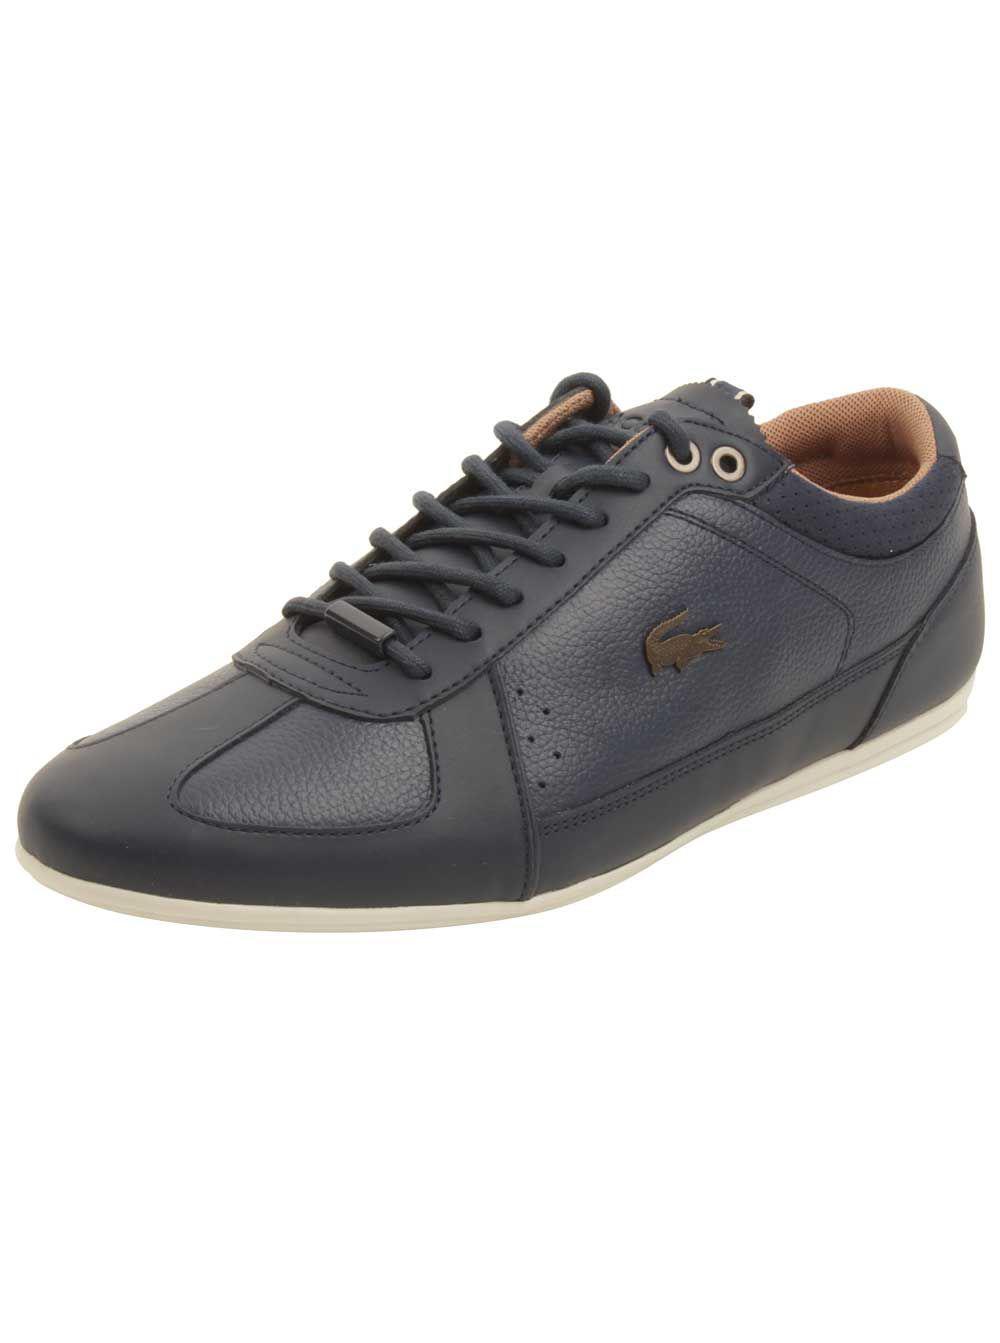 51254047ccaba Lyst - Lacoste Men s Evara 118 1 Sneaker for Men